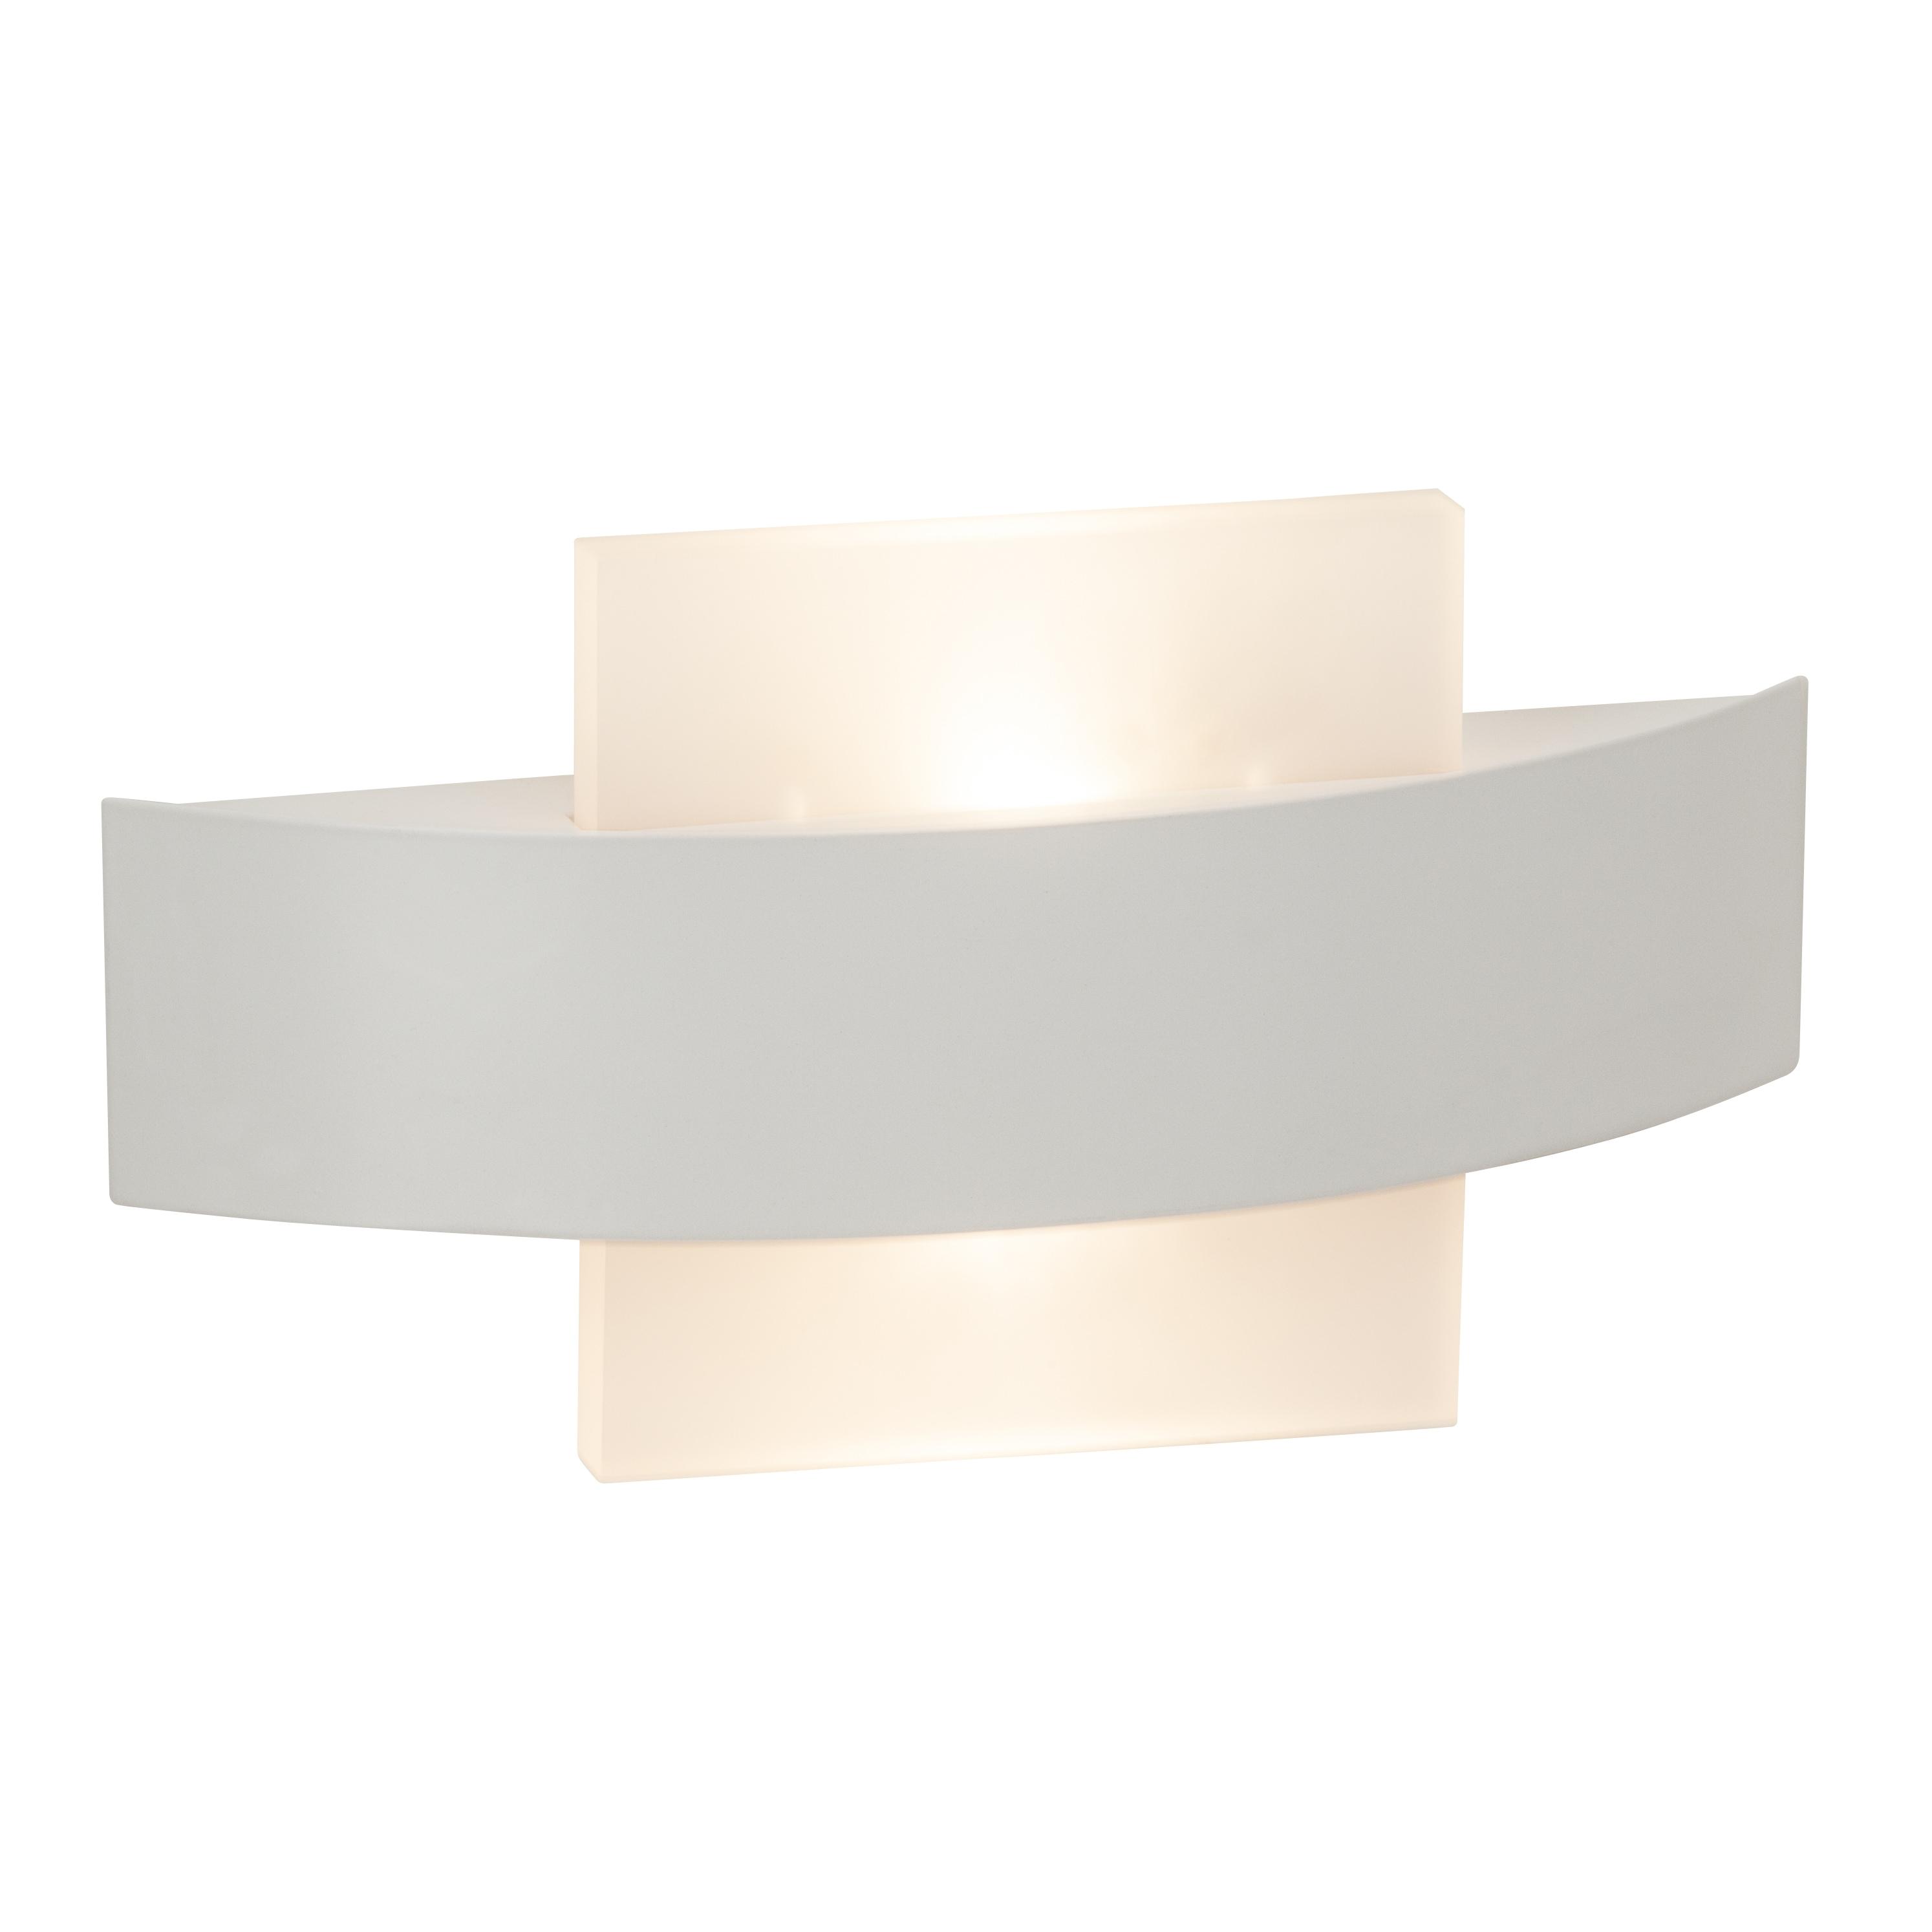 Brilliant Leuchten Solution LED Wandleuchte 26cm quadratisch weiÃY